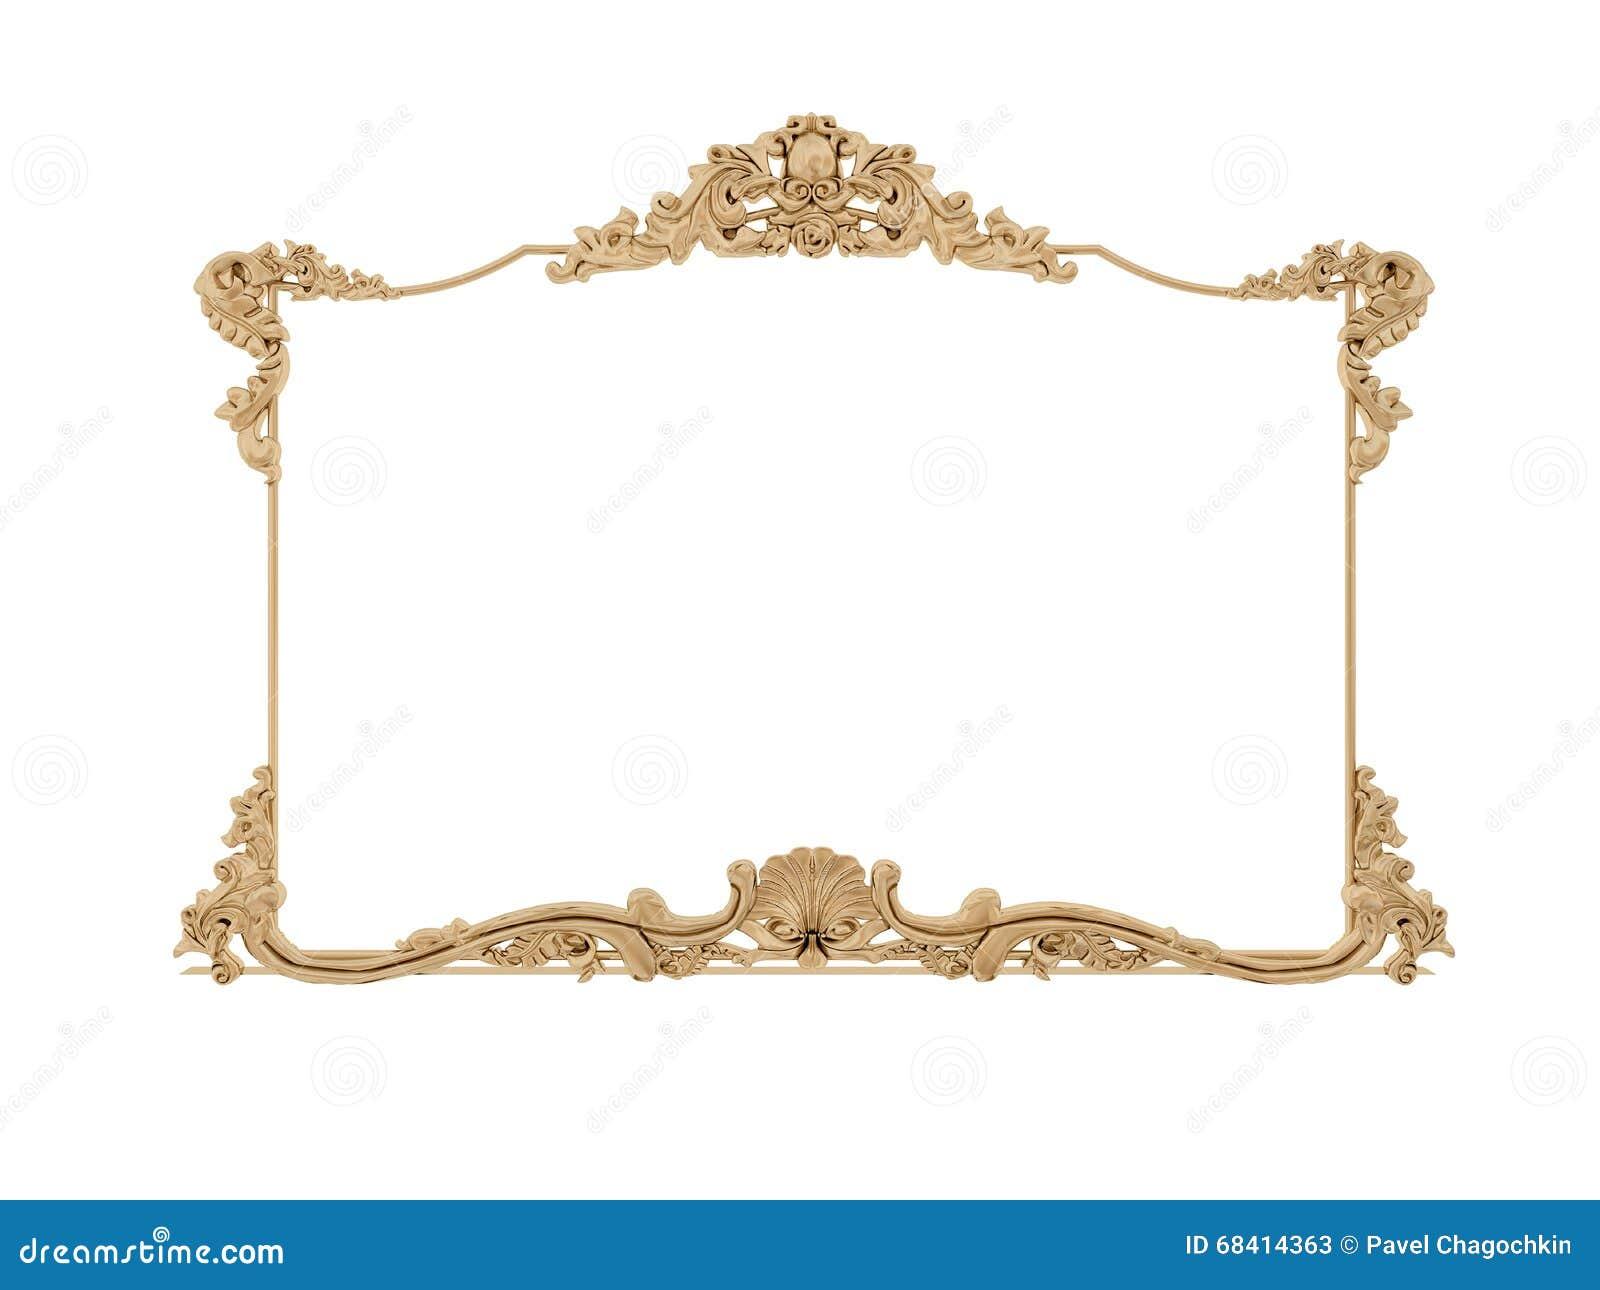 Golden Vintage Frame. Isolate Mirror. Design Retro Element ...